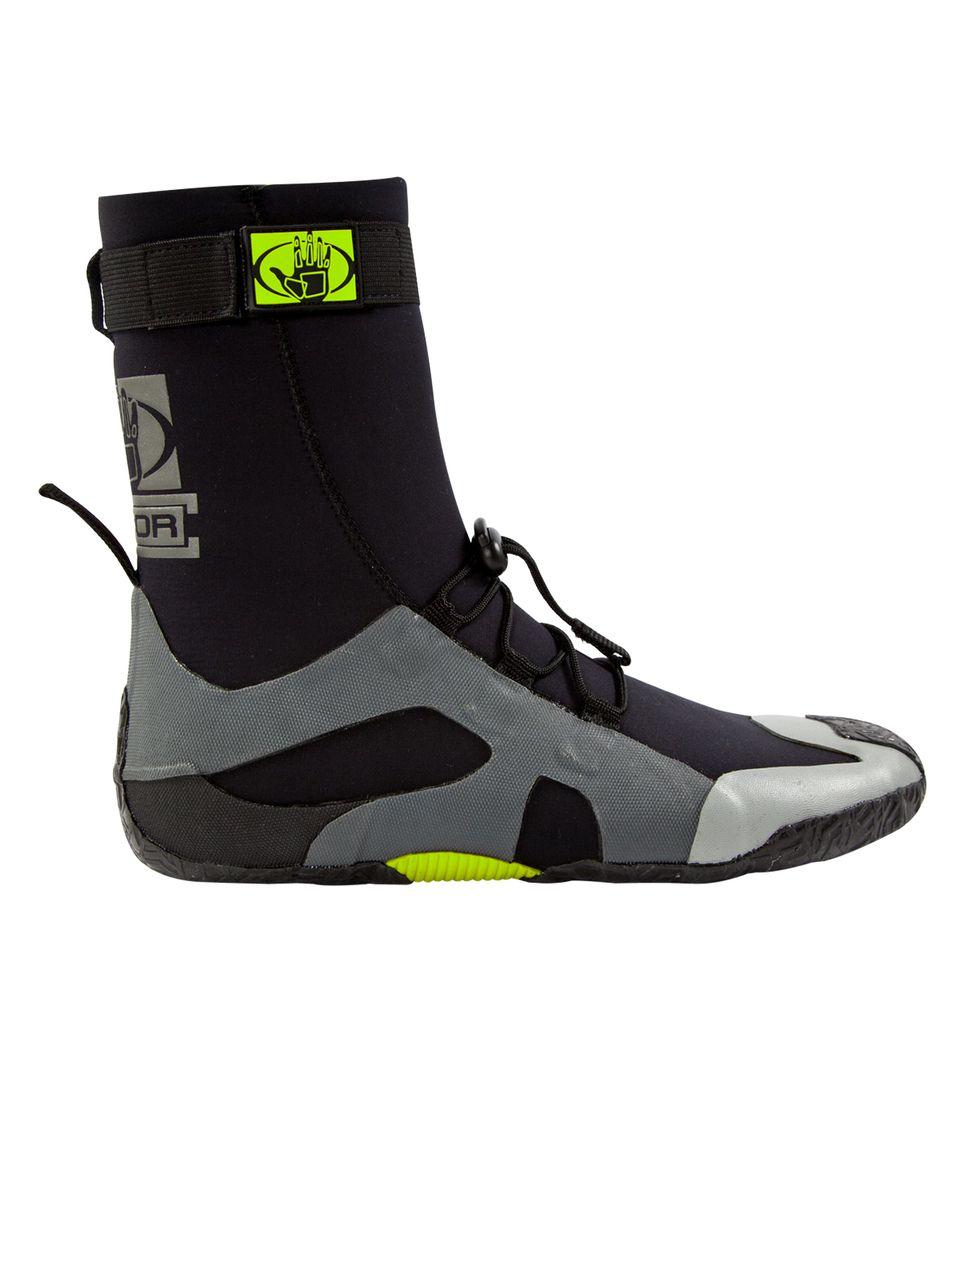 Body Glove 3mm Vapor X Round Toe Boot Discount Surf Co